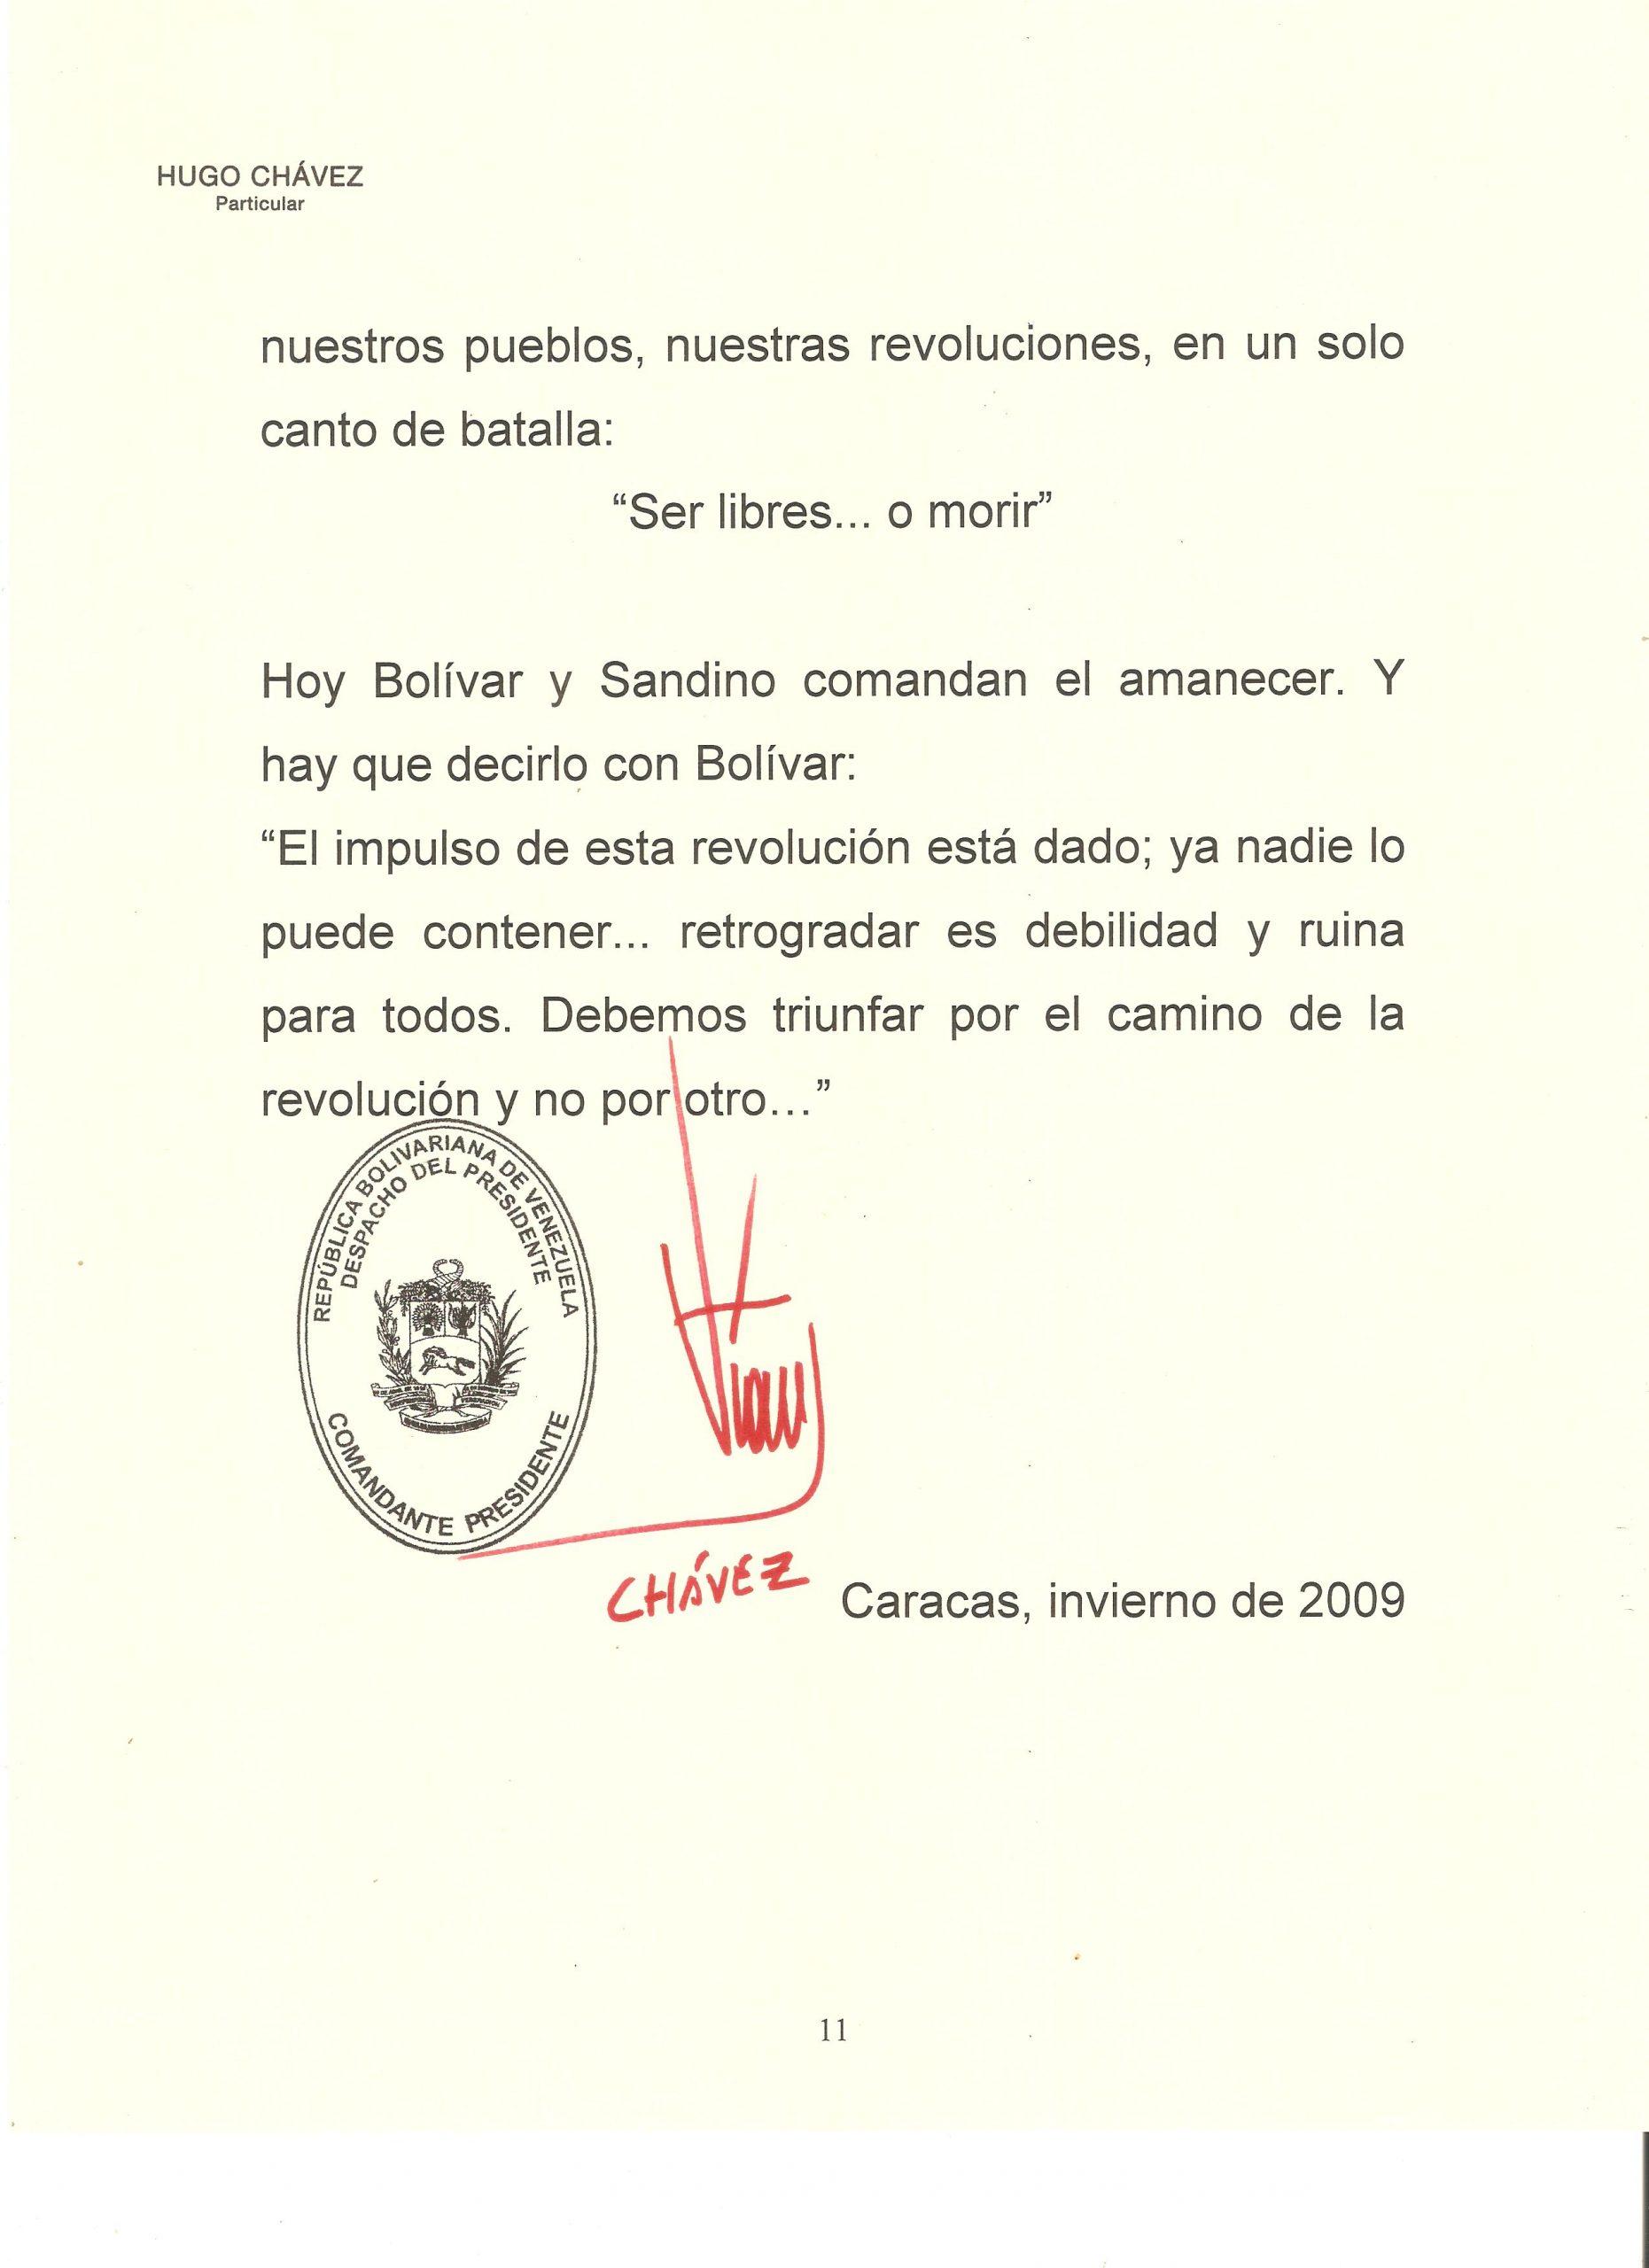 PROLOGO DE HUGO CHAVEZ A WALTER 11